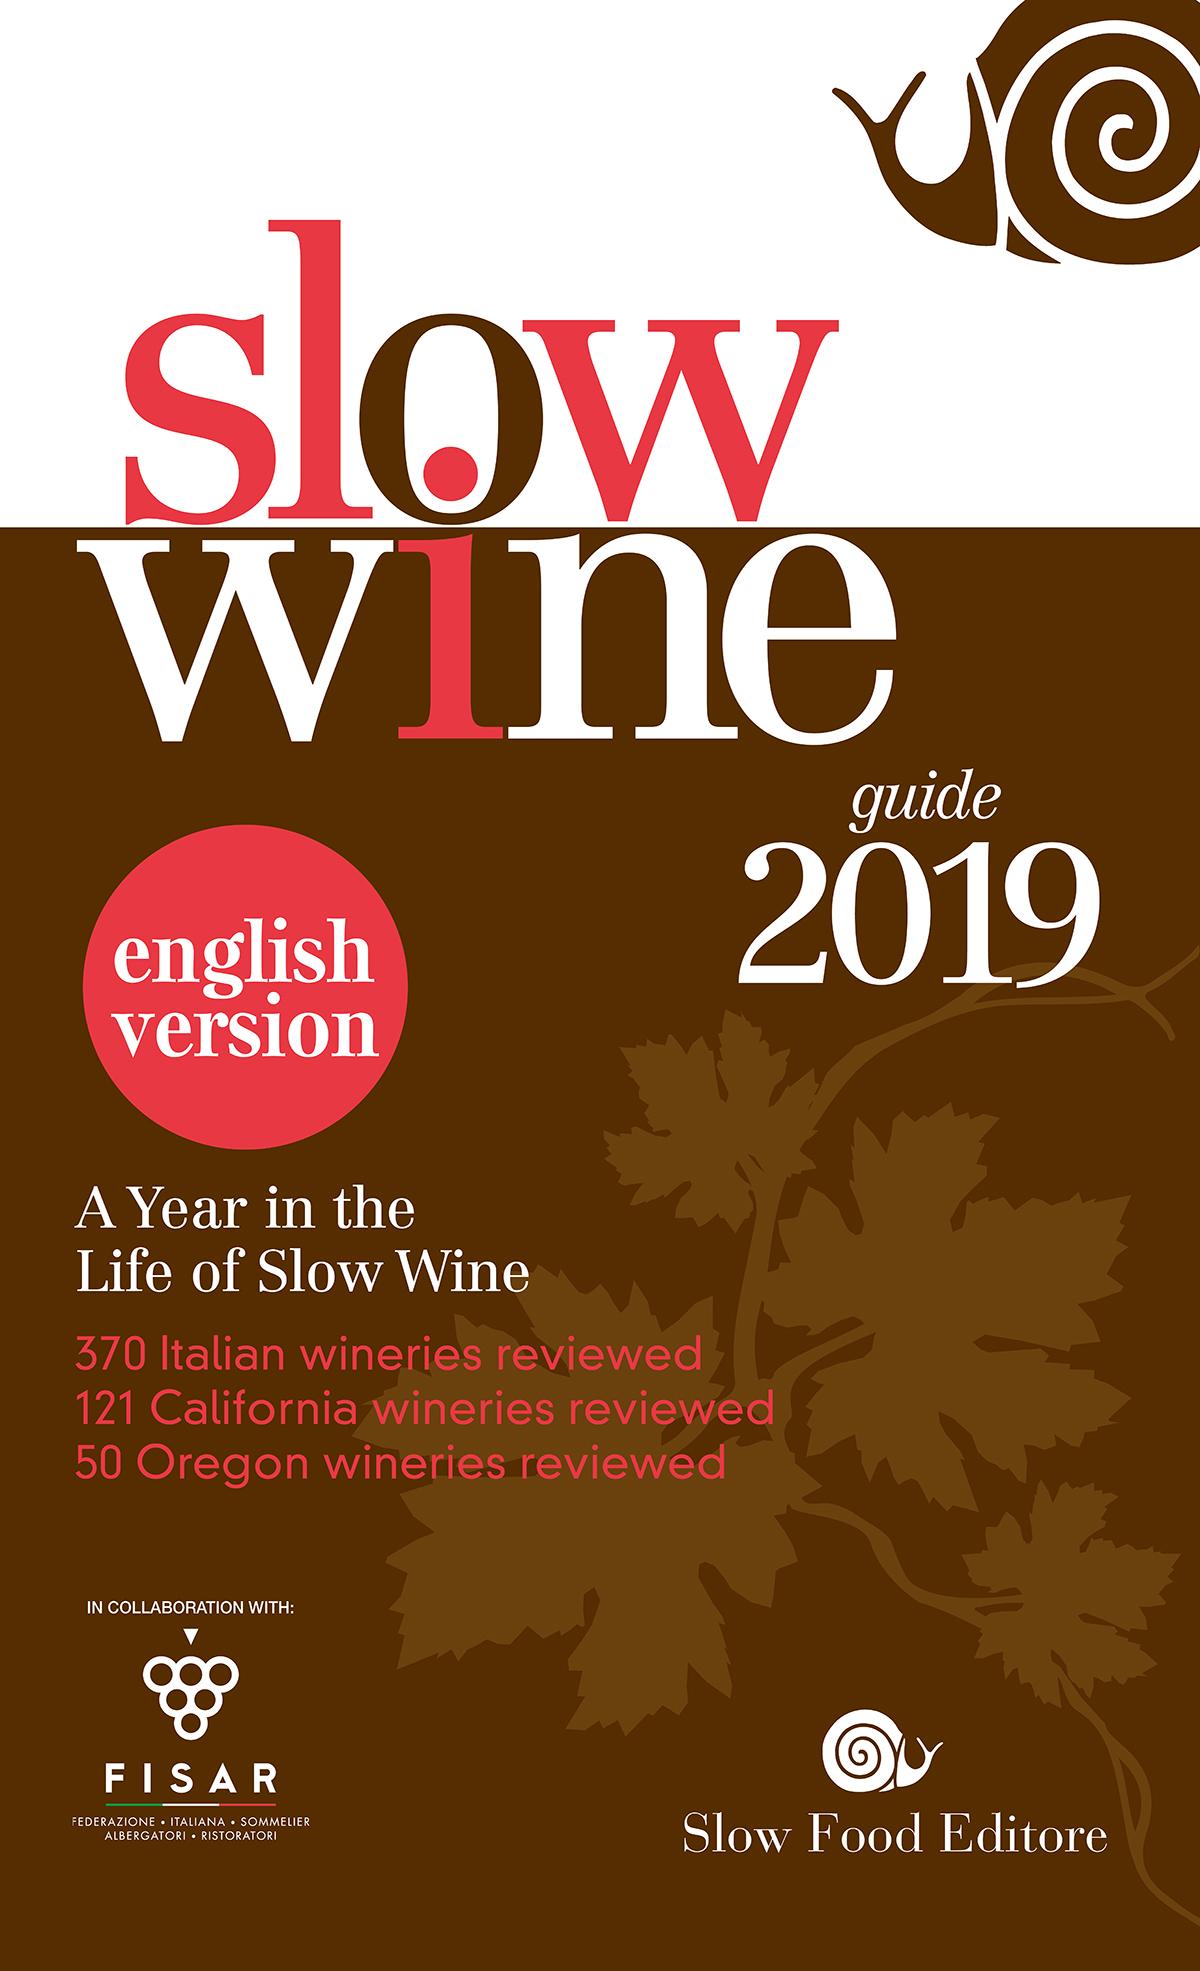 Slow Wine 2019 english version